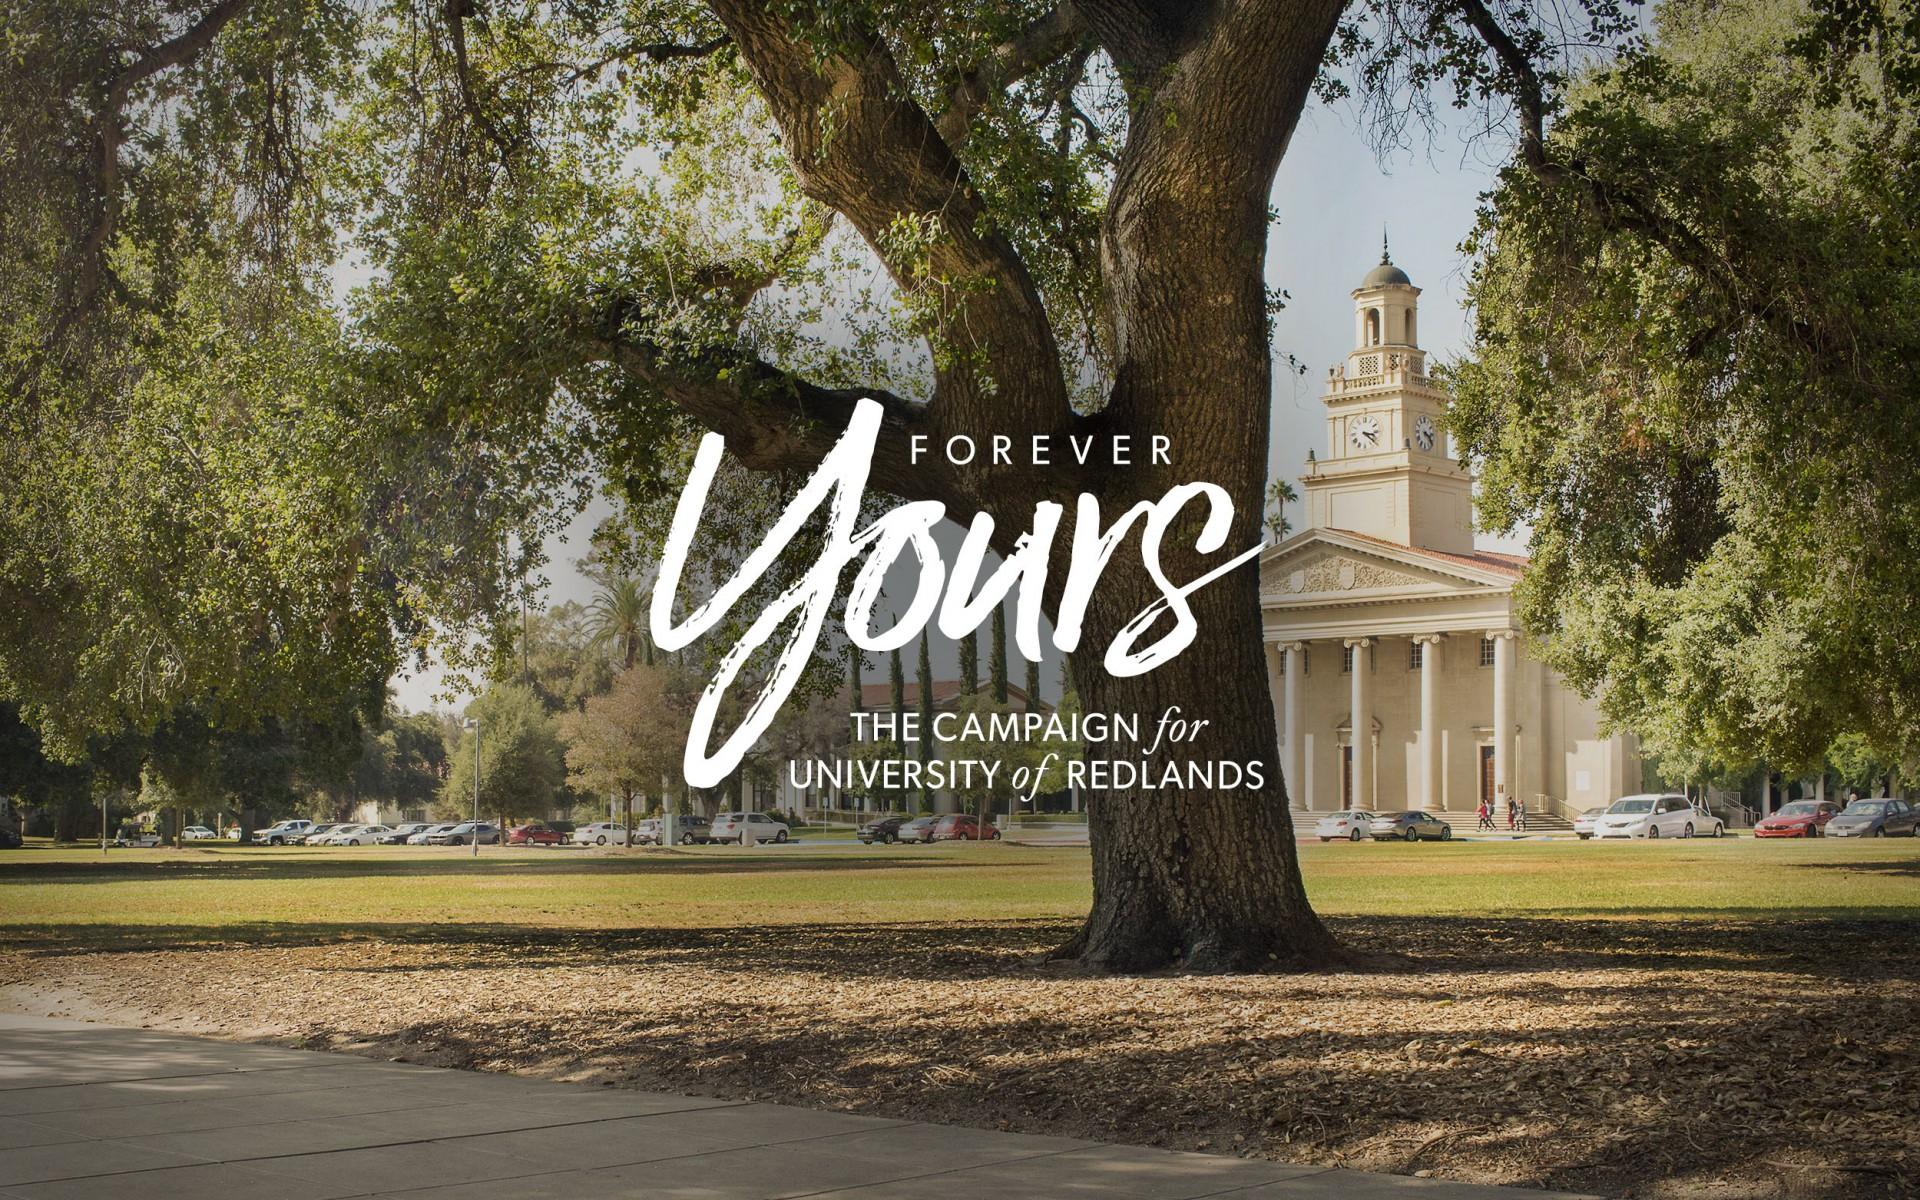 University of Redlands Forever Yours Campaign Logo